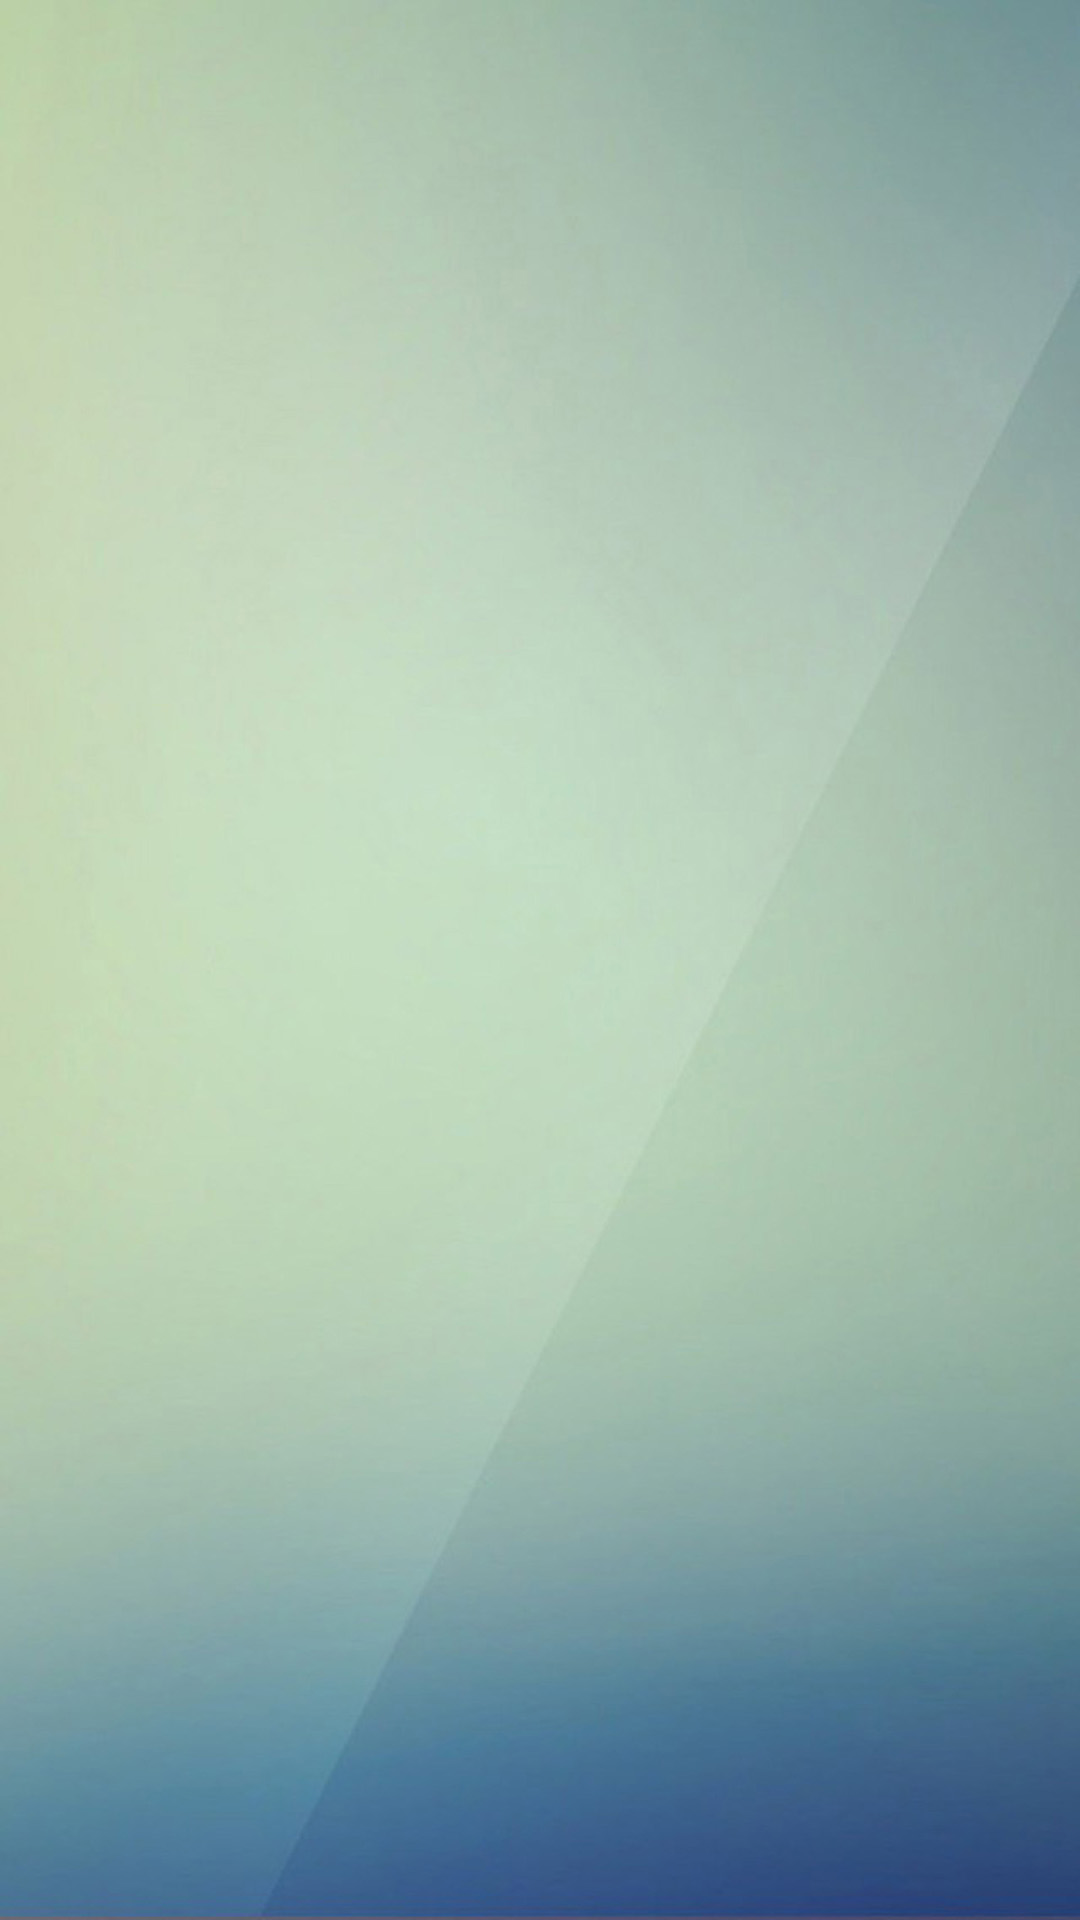 Samsung Galaxy S5 Wallpapers 60 Samsung Galaxy S5 Wallpapers 1080x1920